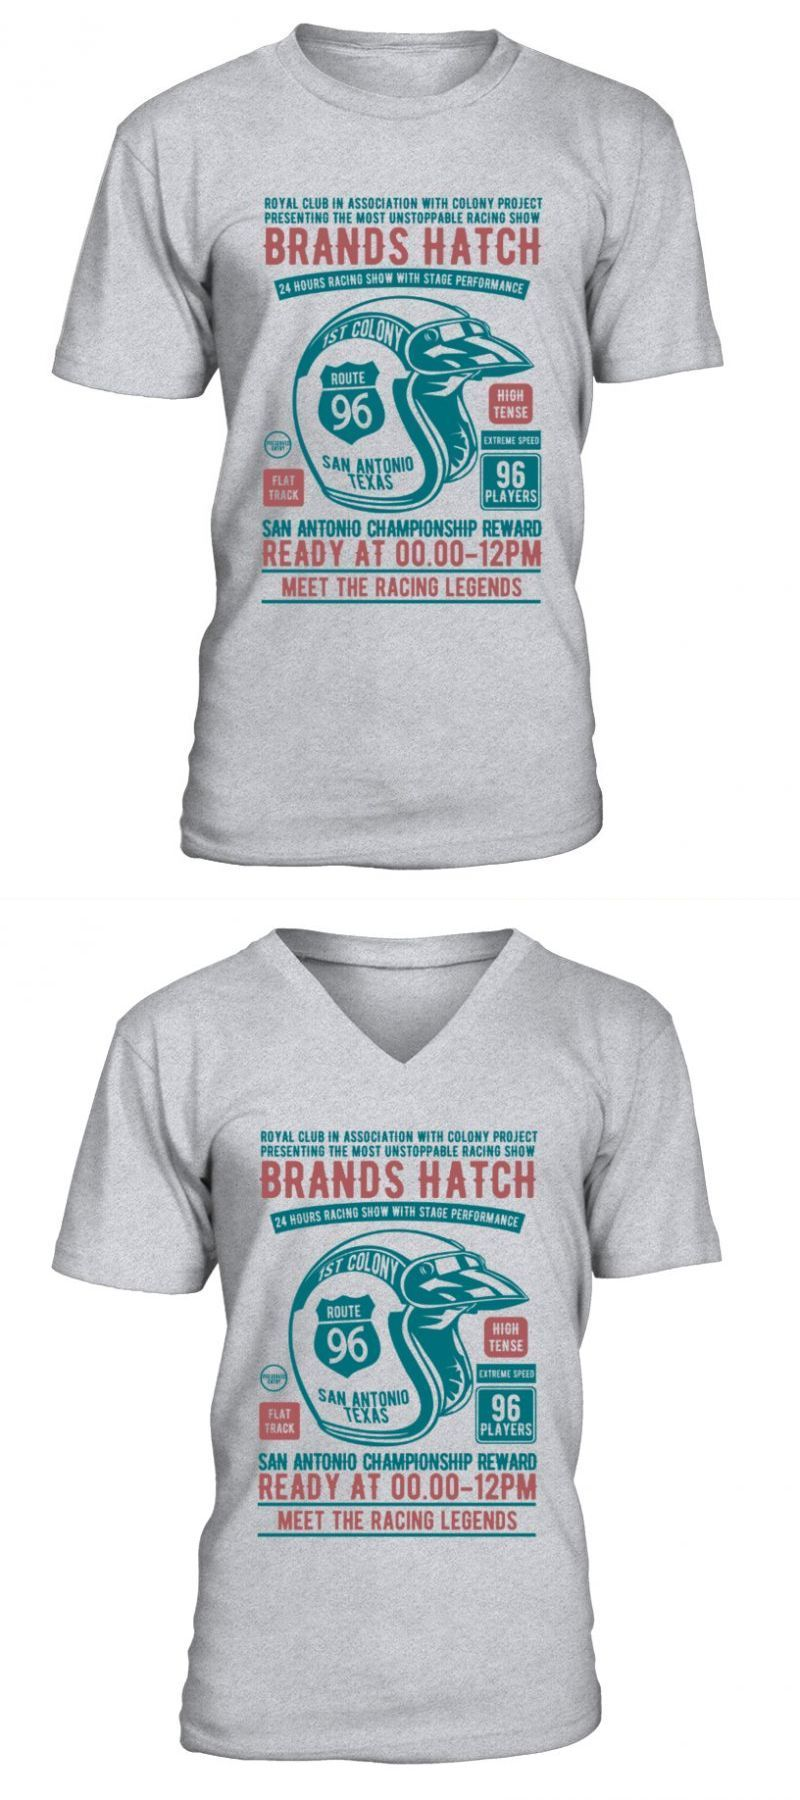 Brands Hatch Racing T-Shirt Mens Tee